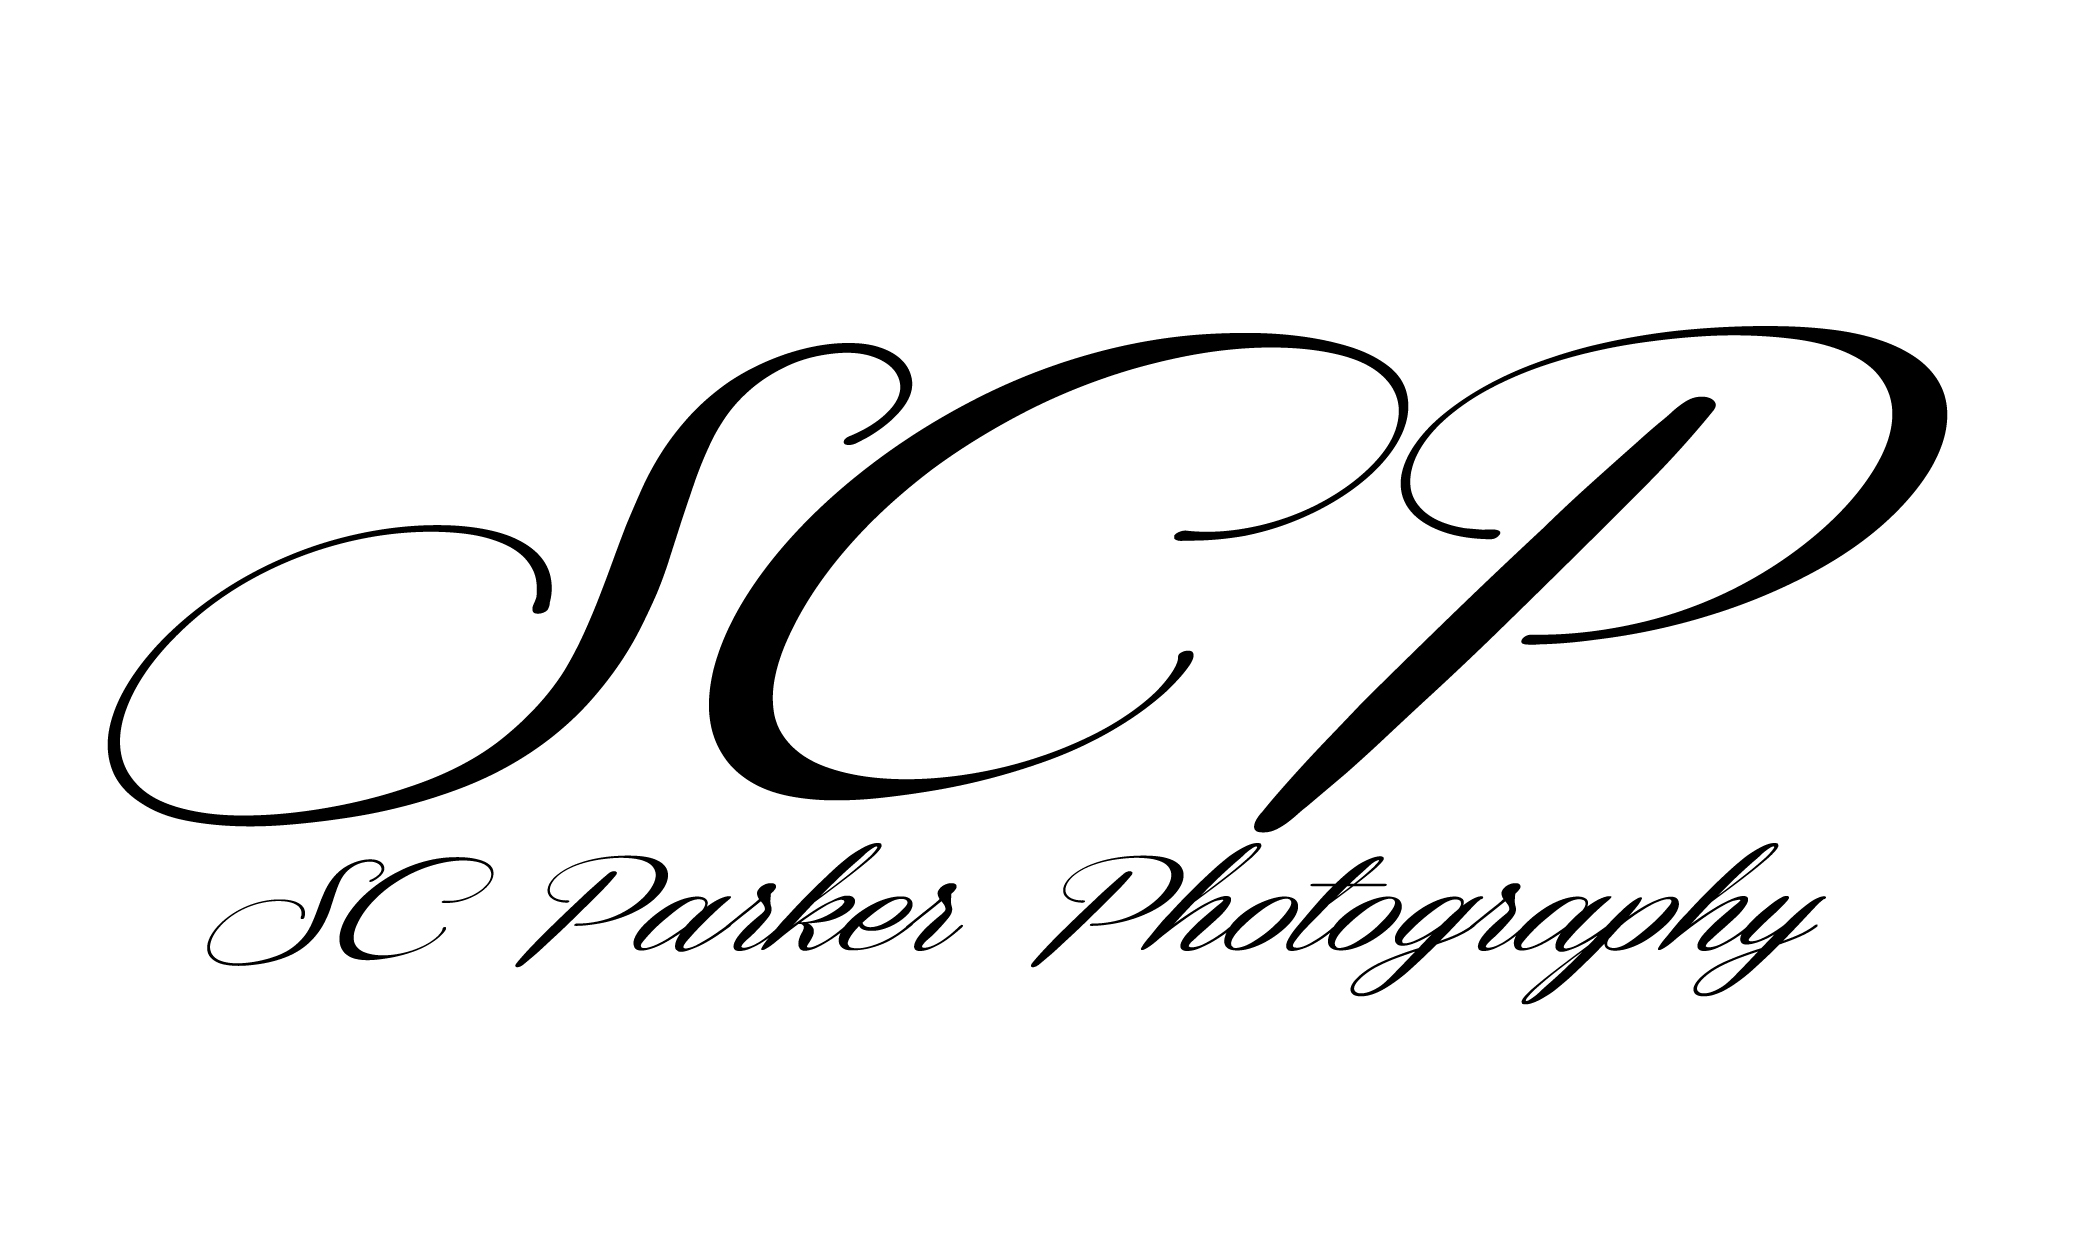 SC Parker Photography